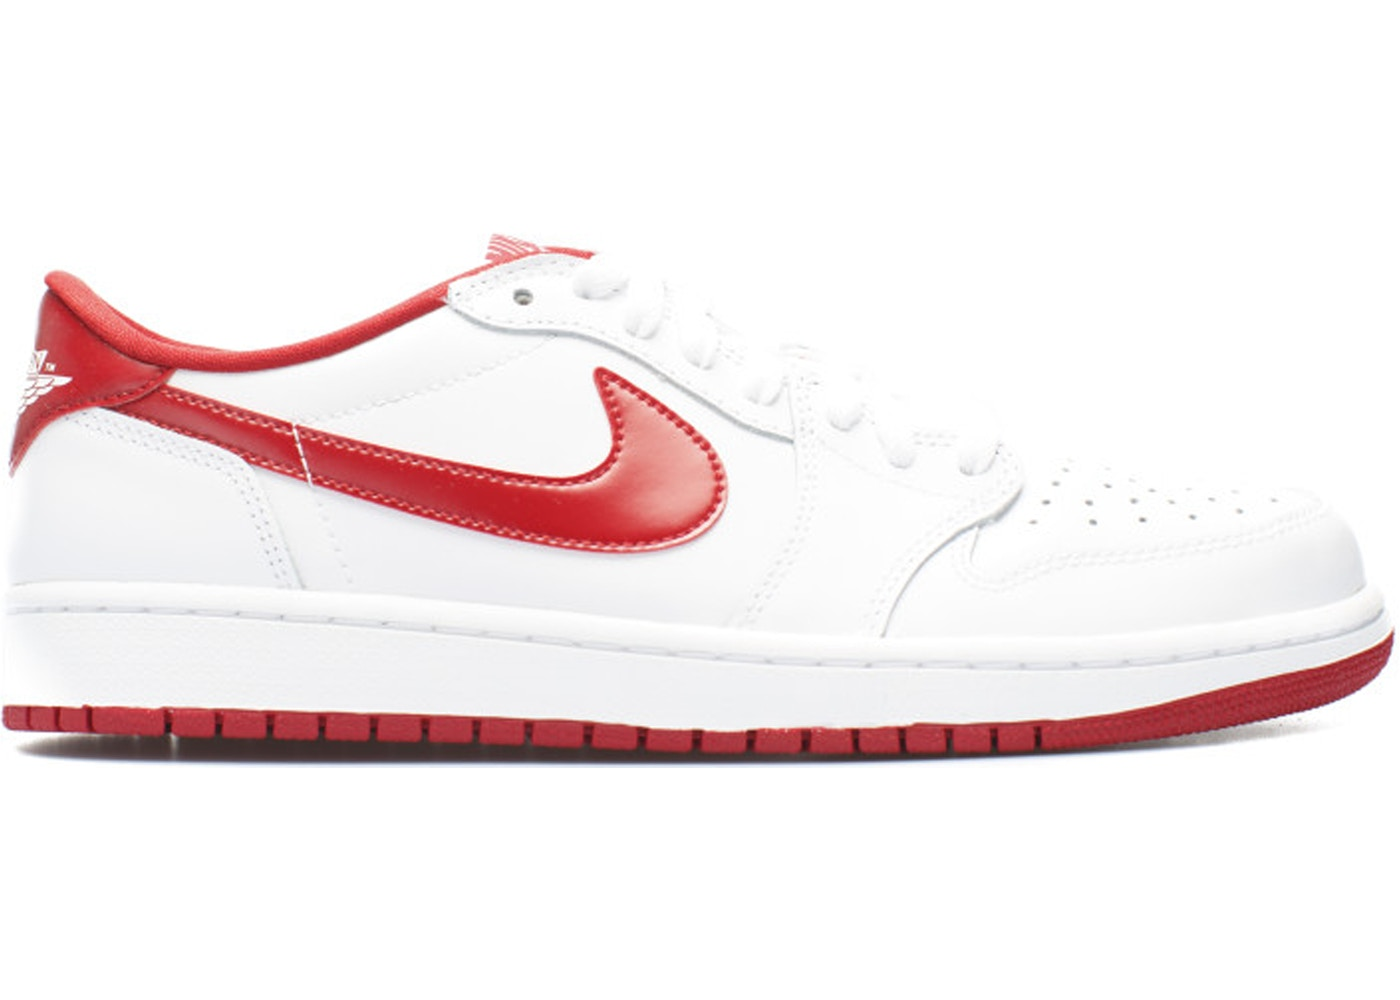 49e9ea0f0cb Sell. or Ask. Size: 9.5. View All Bids. Jordan 1 Retro Low White ...